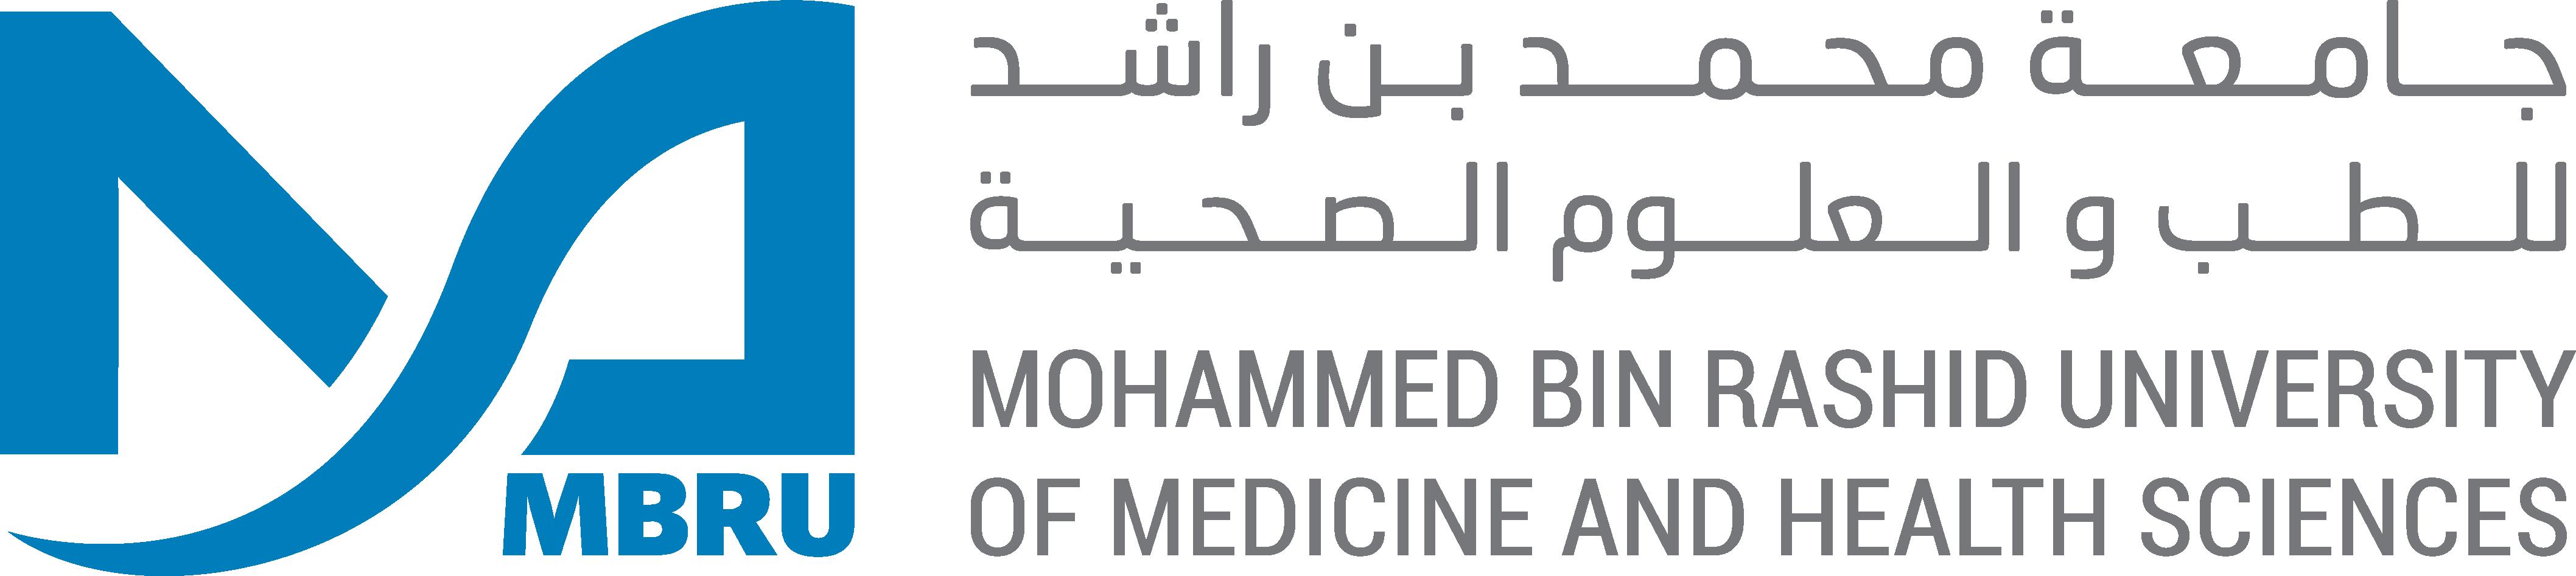 Mohammed Bin Rashid University Of Medicine And Health Sciences